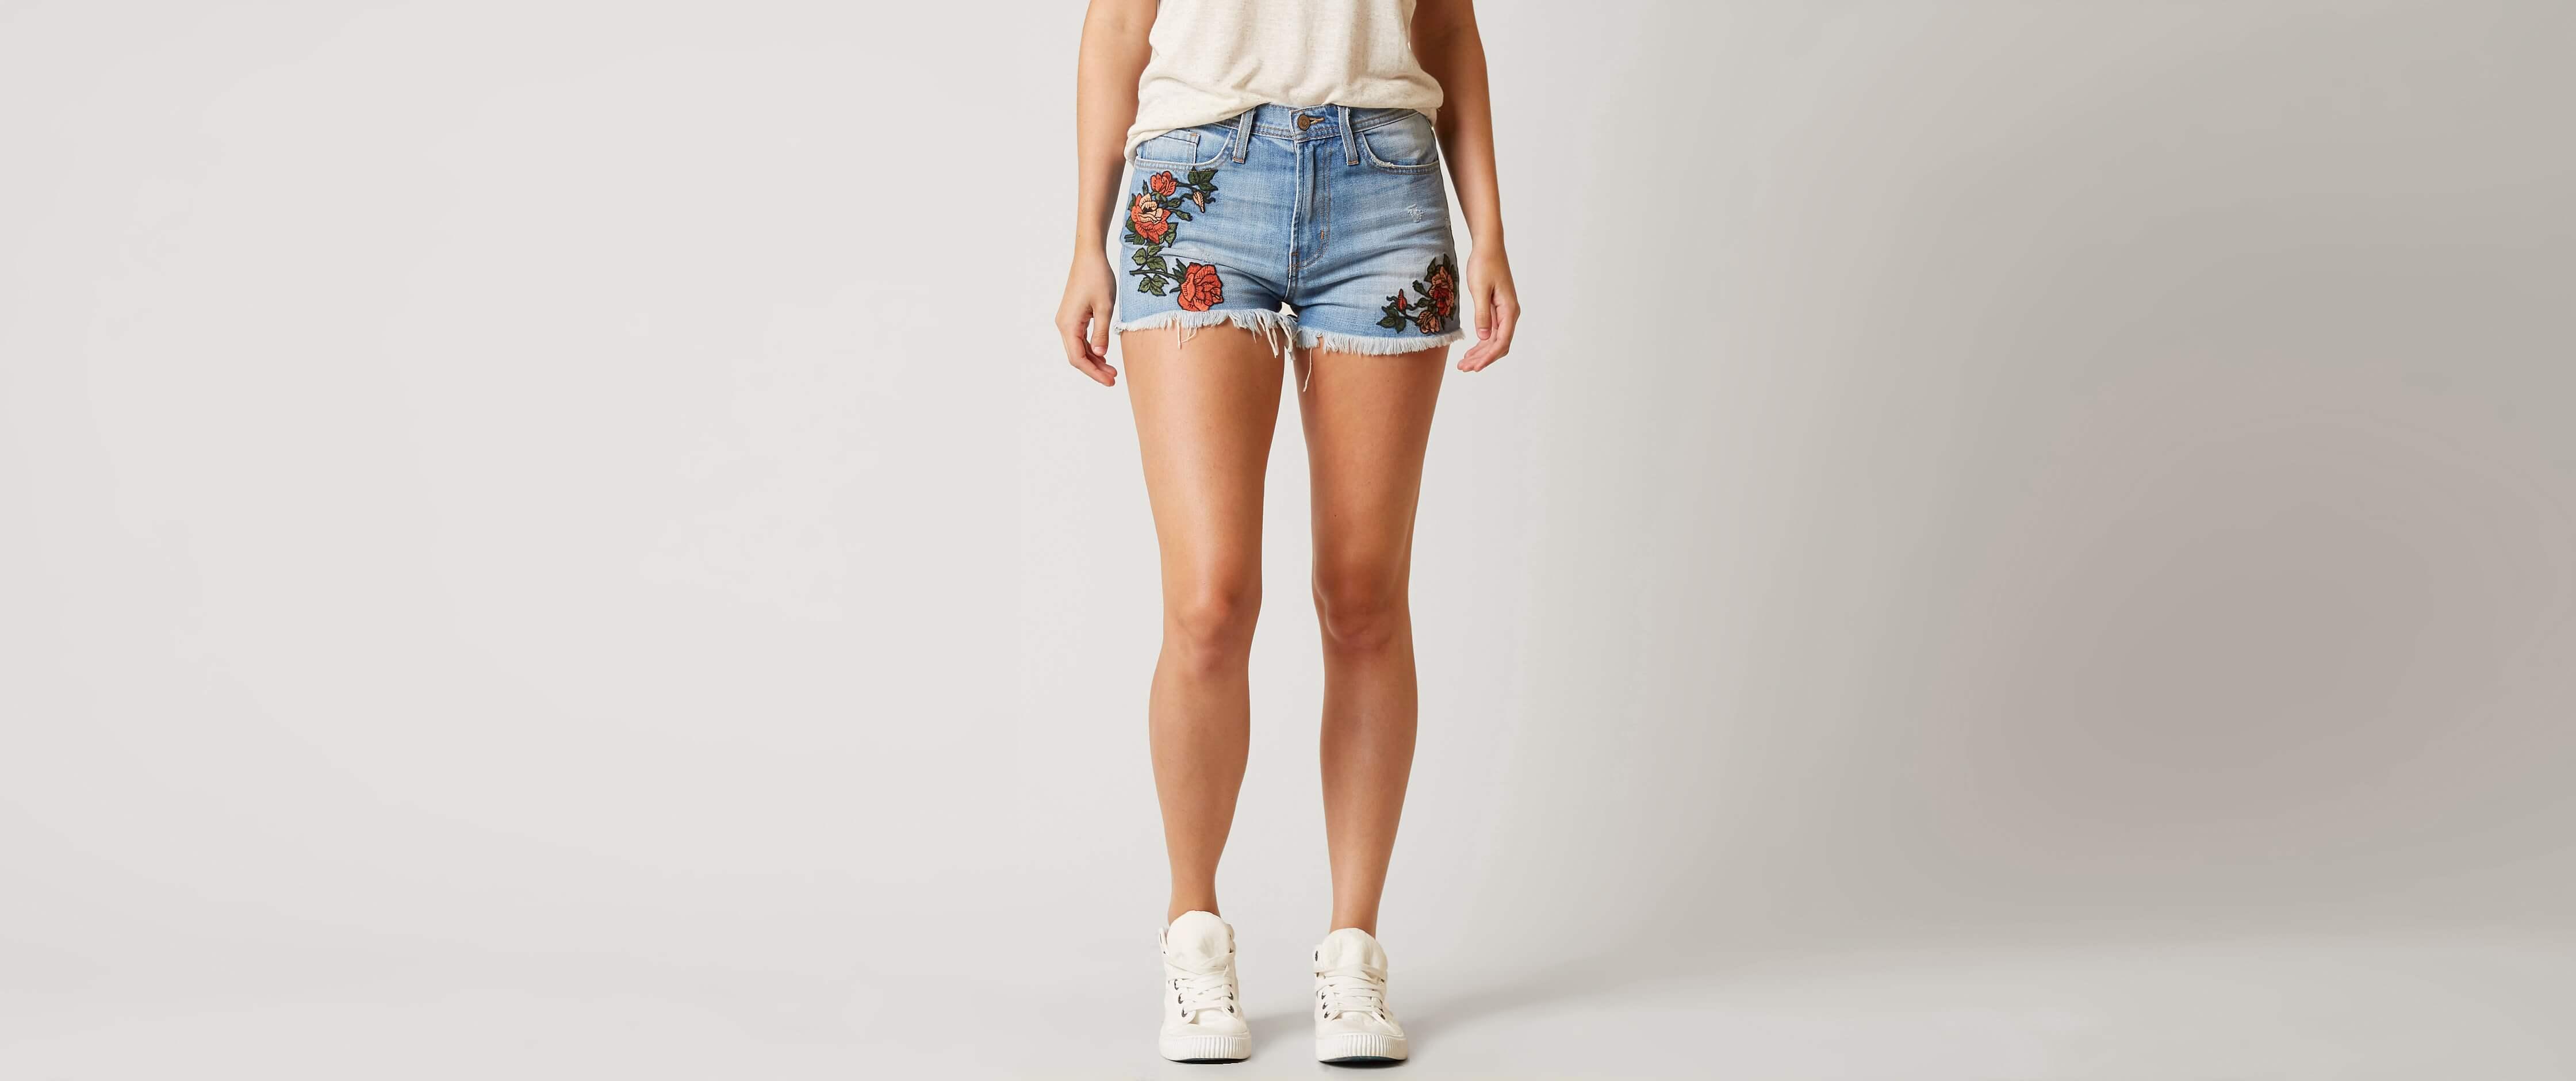 Womens high waisted jean shorts